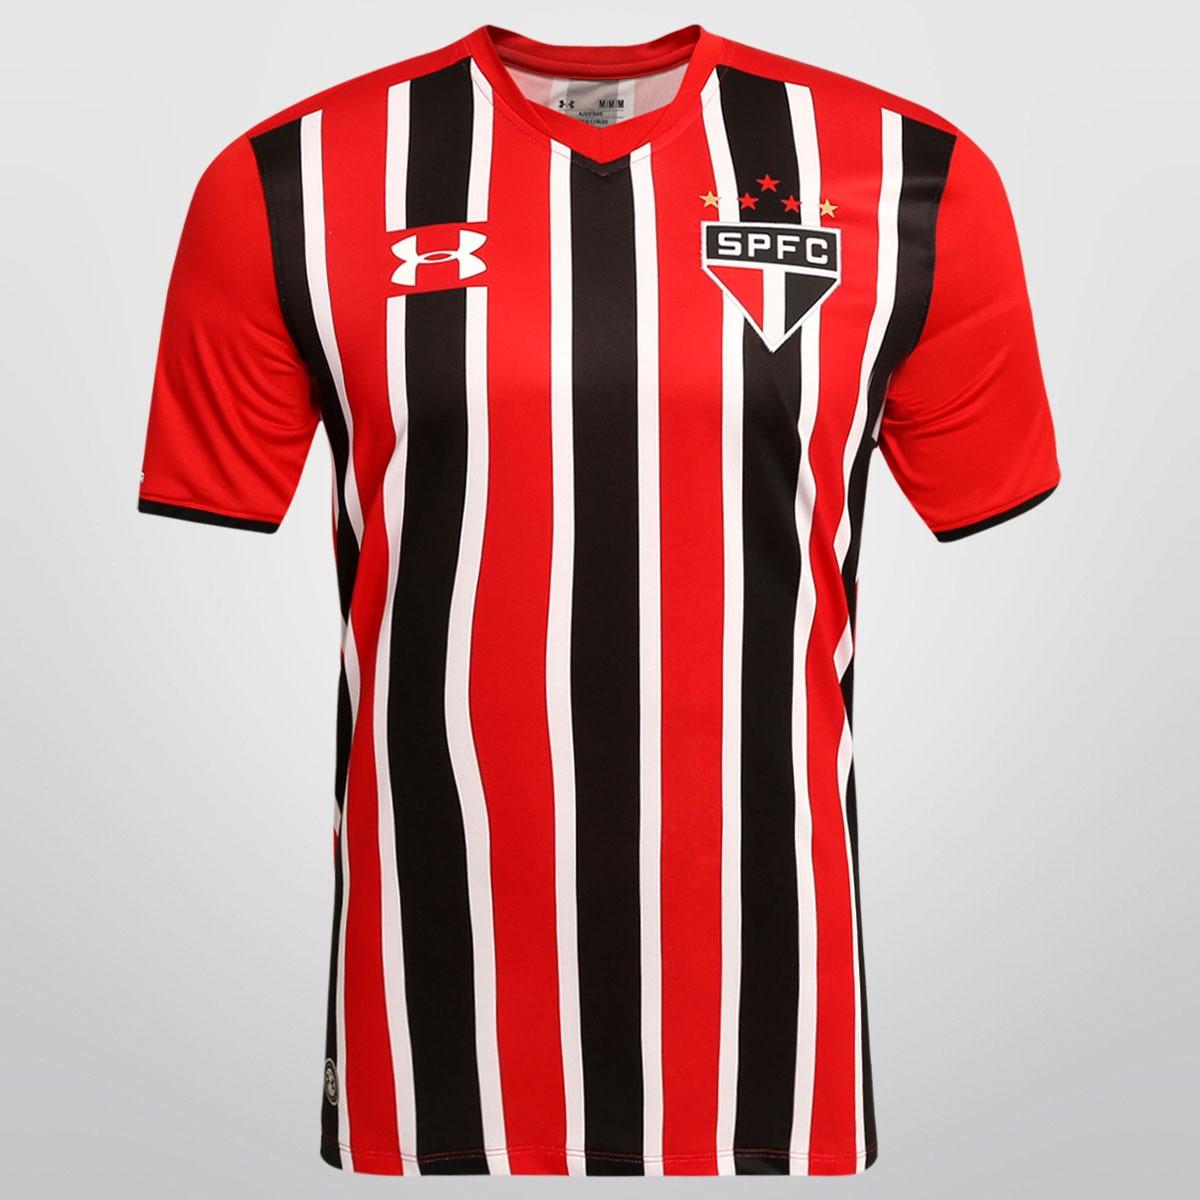 692b10d0c43 Camisa Under Armour São Paulo 2 2016 C nf Orig De 249